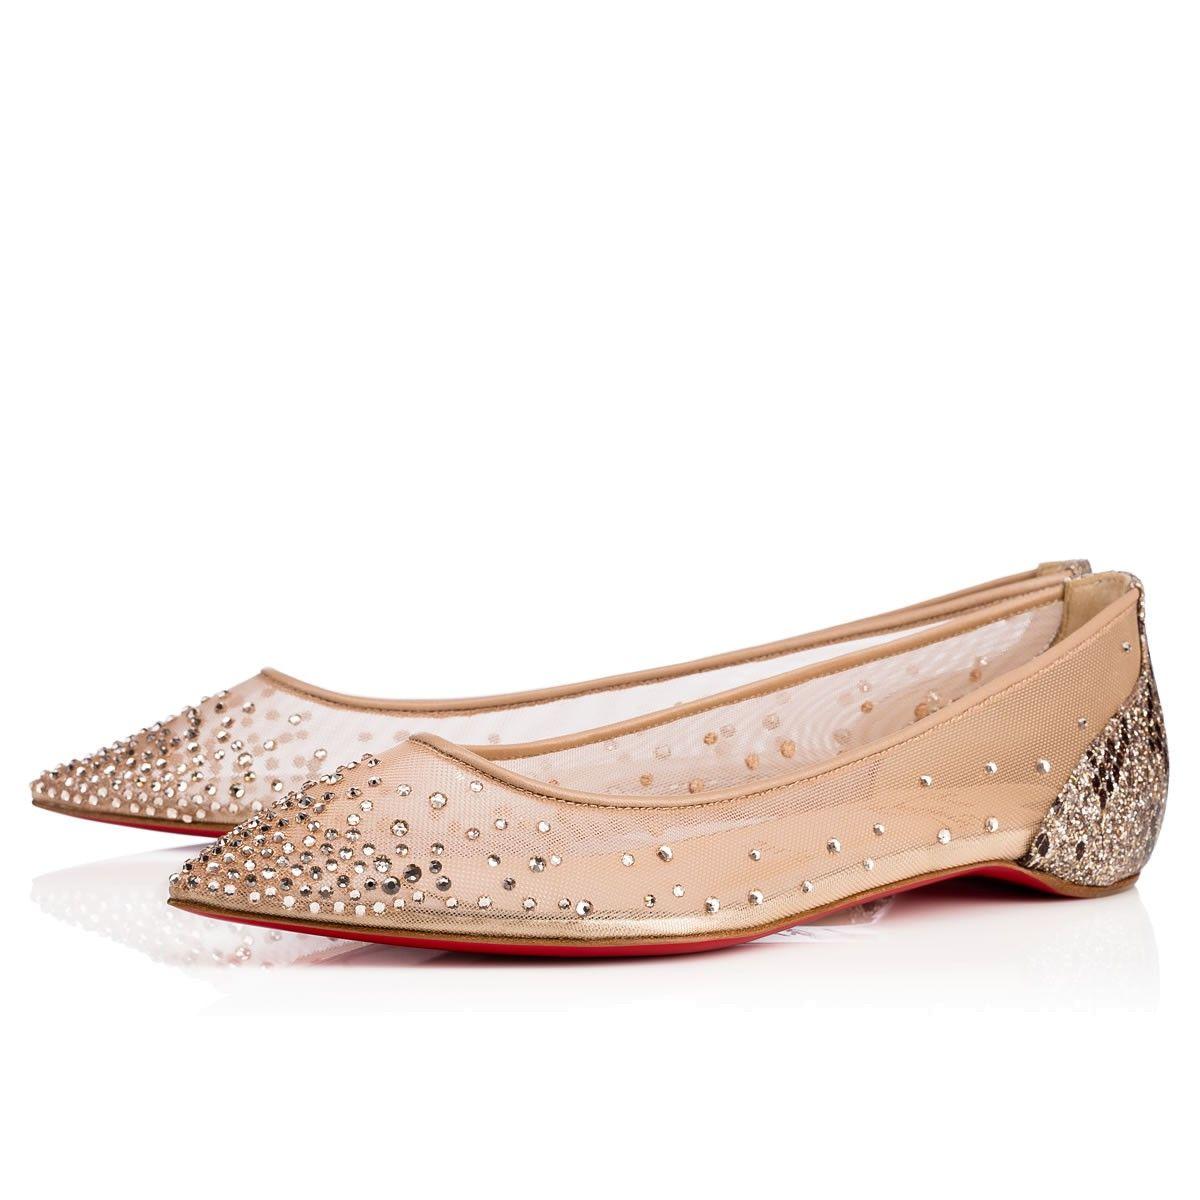 0fae650ea48e CHRISTIAN LOUBOUTIN Follies Strass Flat Version Light Silk Strass - Women  Shoes - Christian Louboutin.  christianlouboutin  shoes